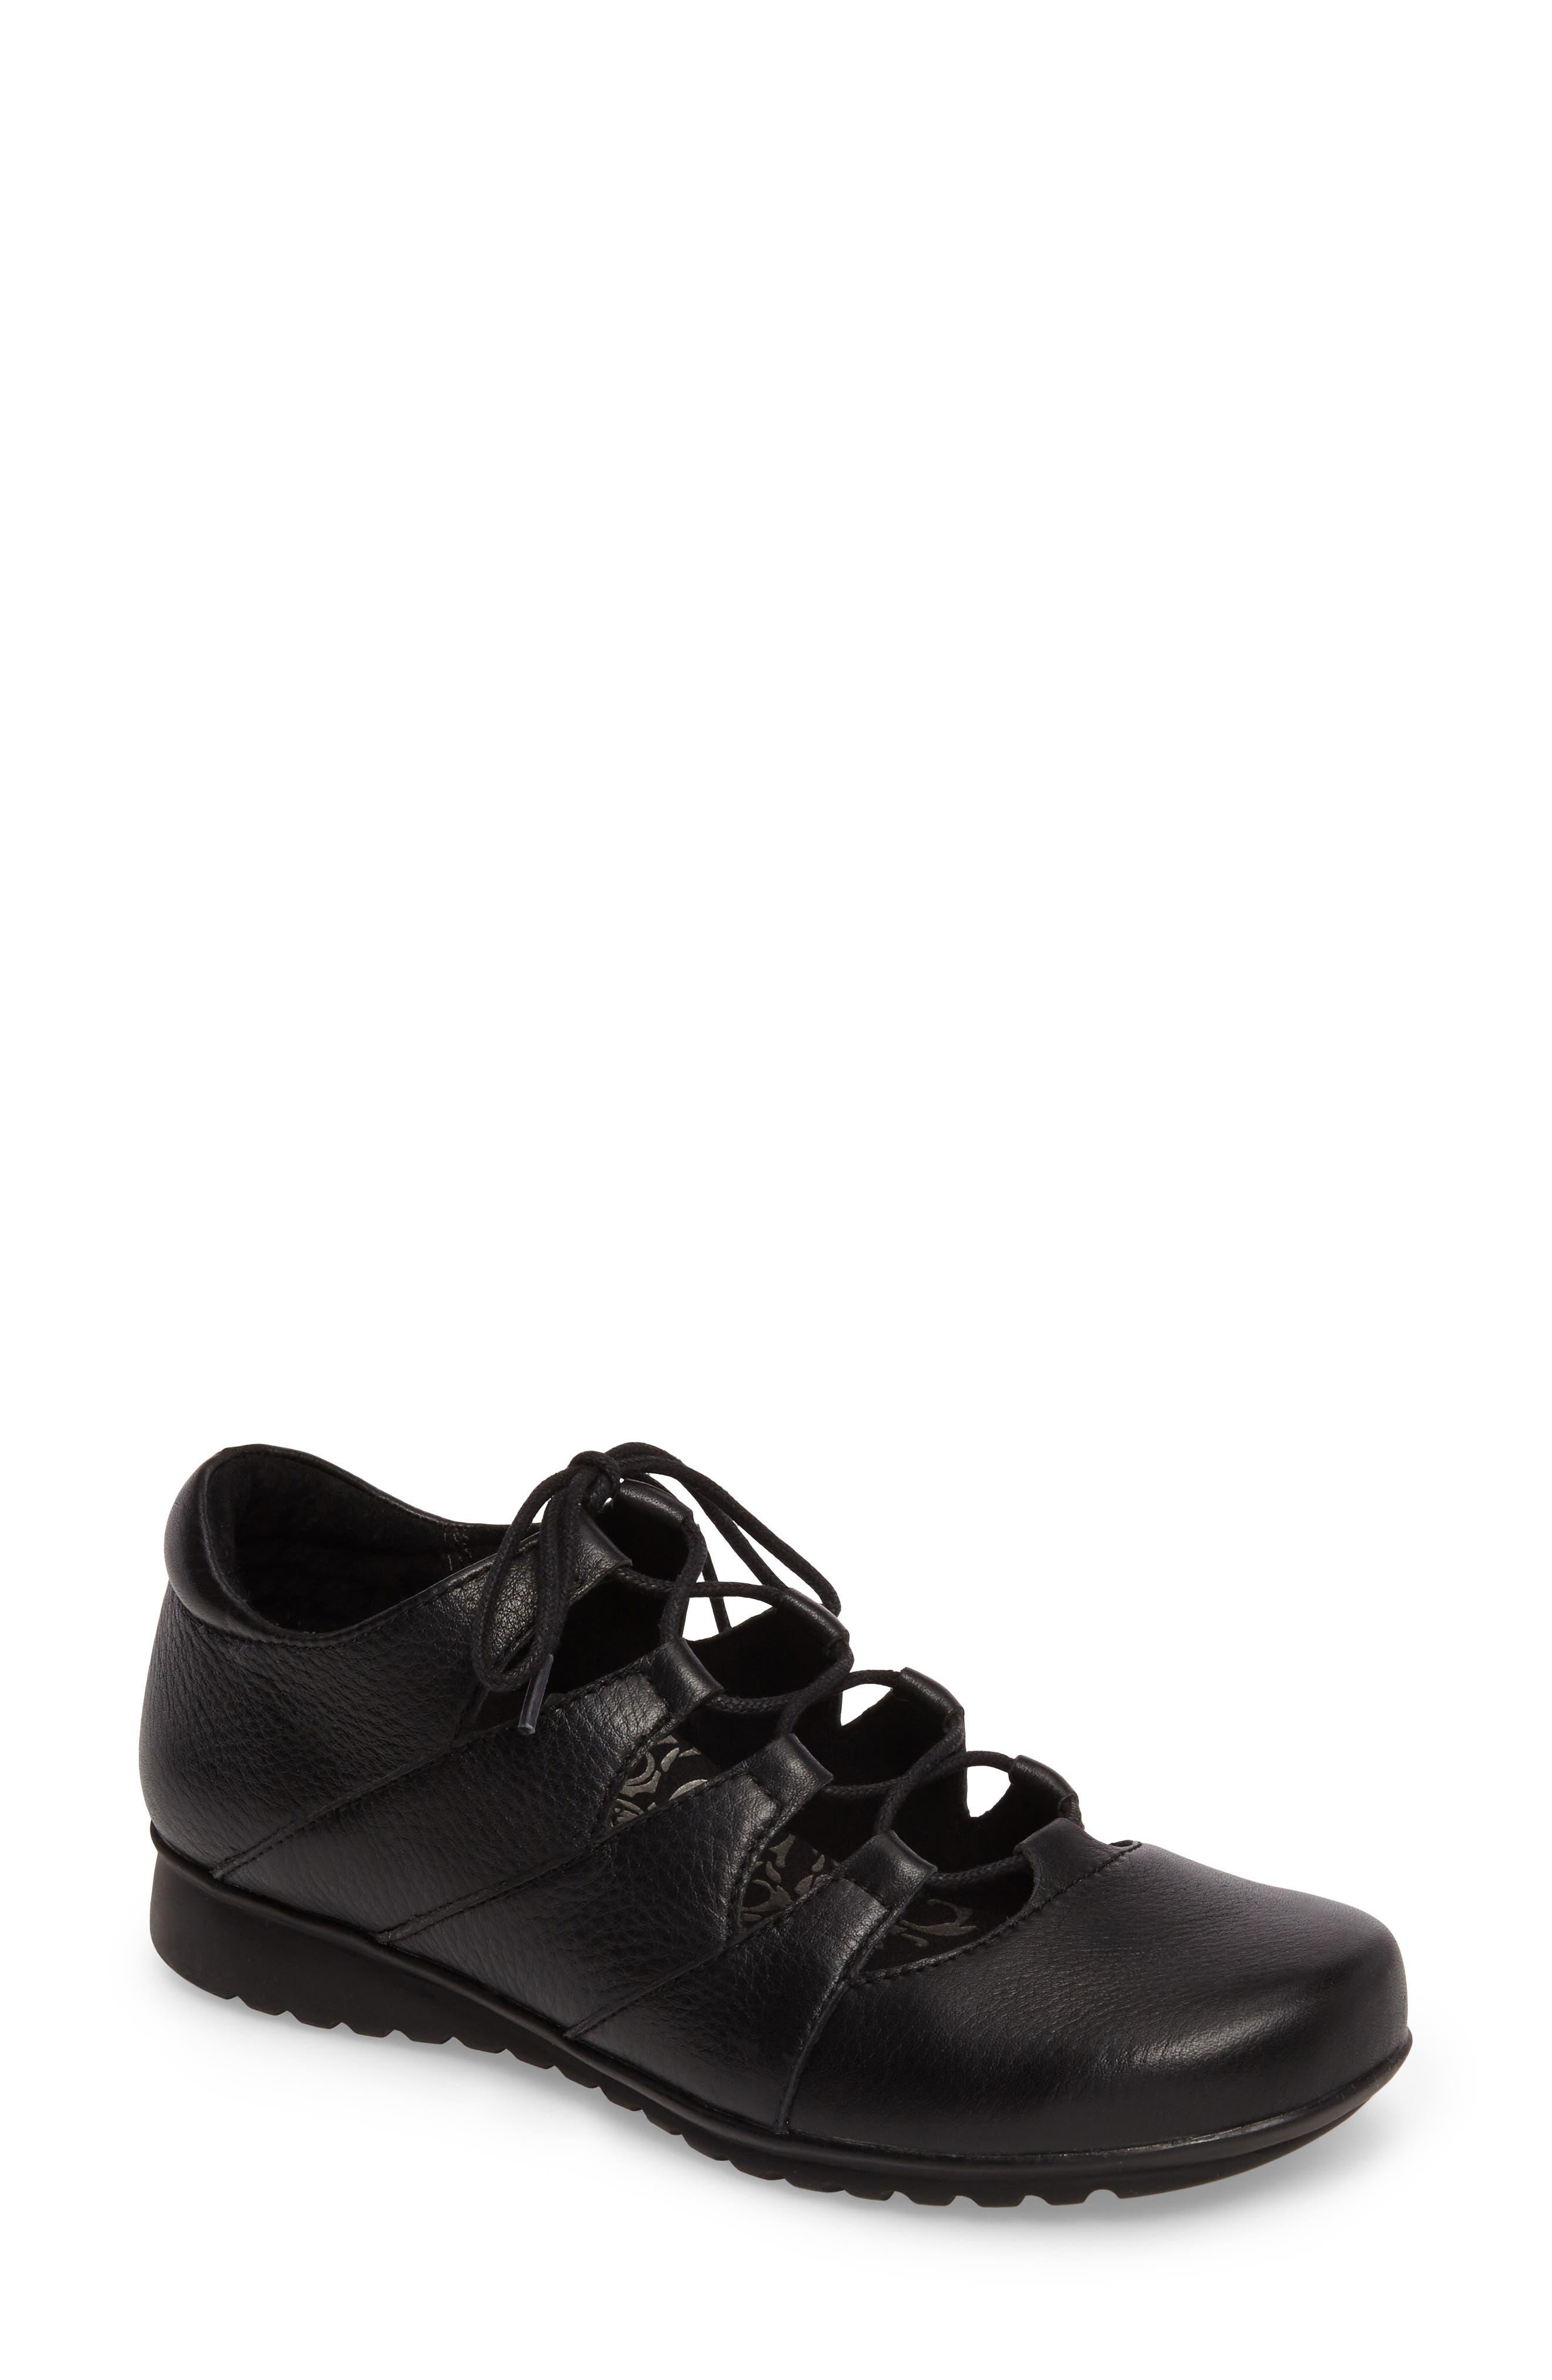 AETREX Sienna Cutout Sneaker, Main, color, BLACK LEATHER/ BLACK